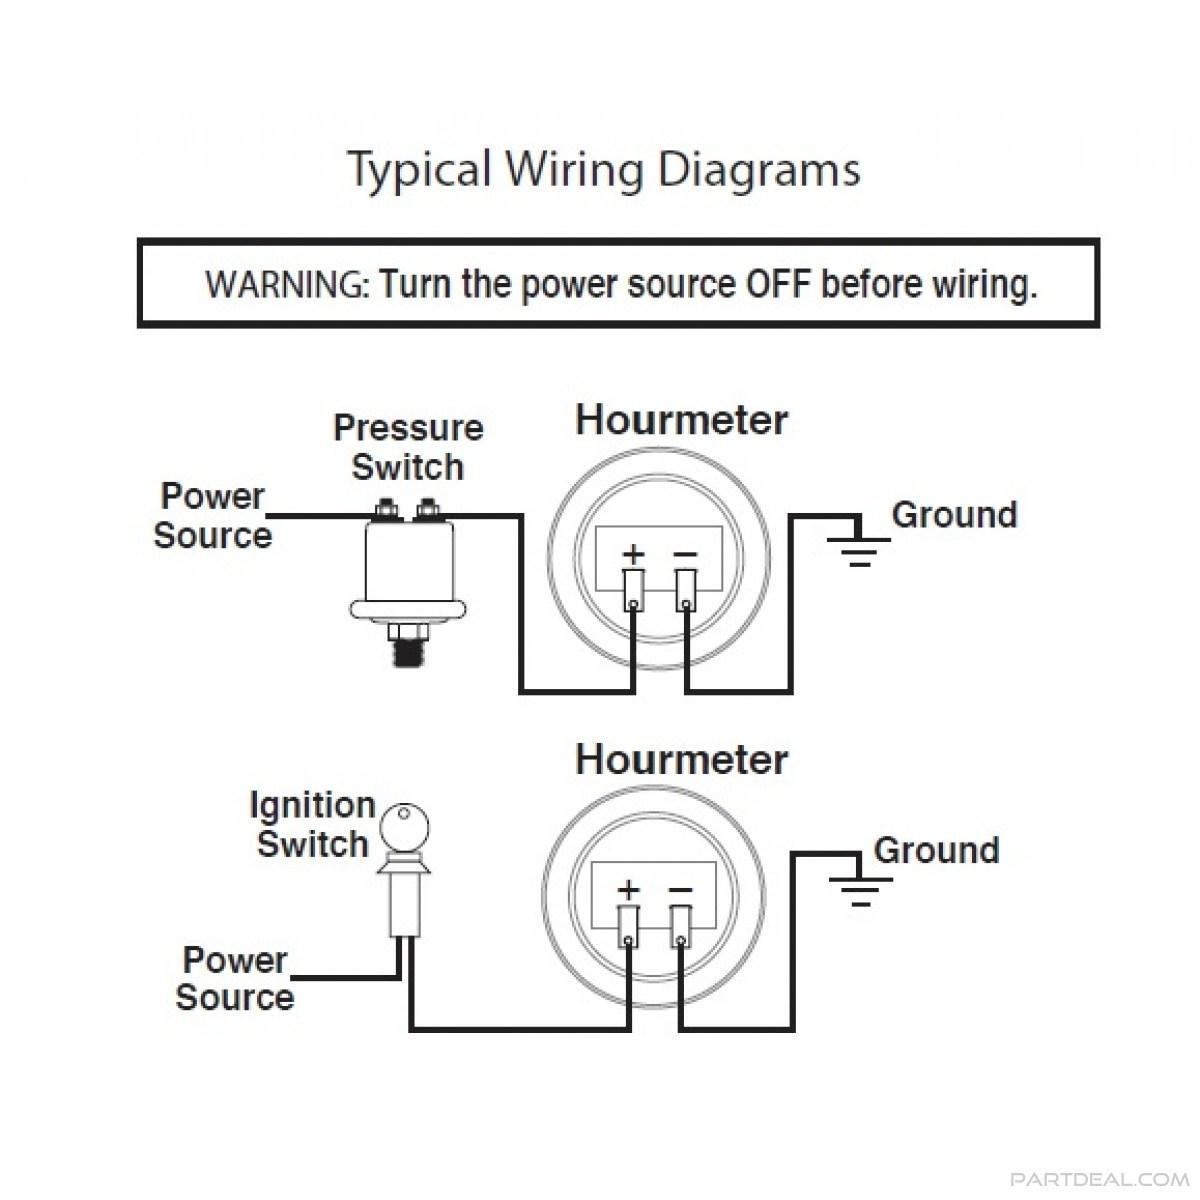 boat tachometer wiring diagram free picture schematic vdo tachometer with hour meter wiring diagram wiring diagram data  vdo tachometer with hour meter wiring